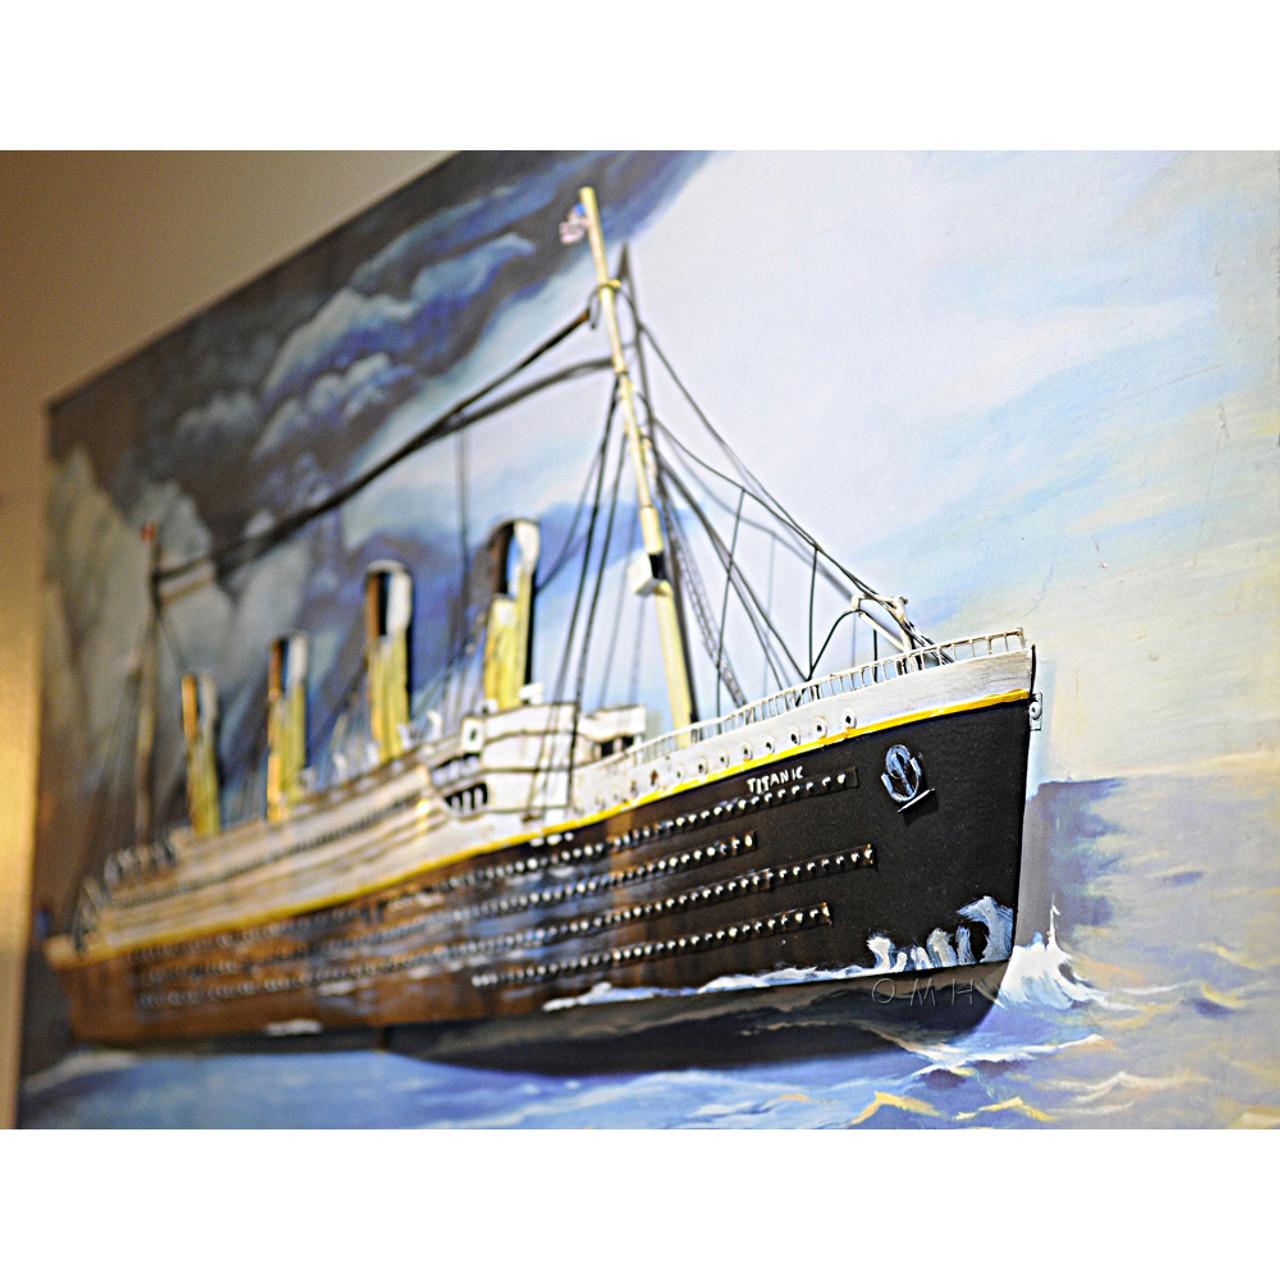 Titanic 3D Metal Model Painting White Star Line